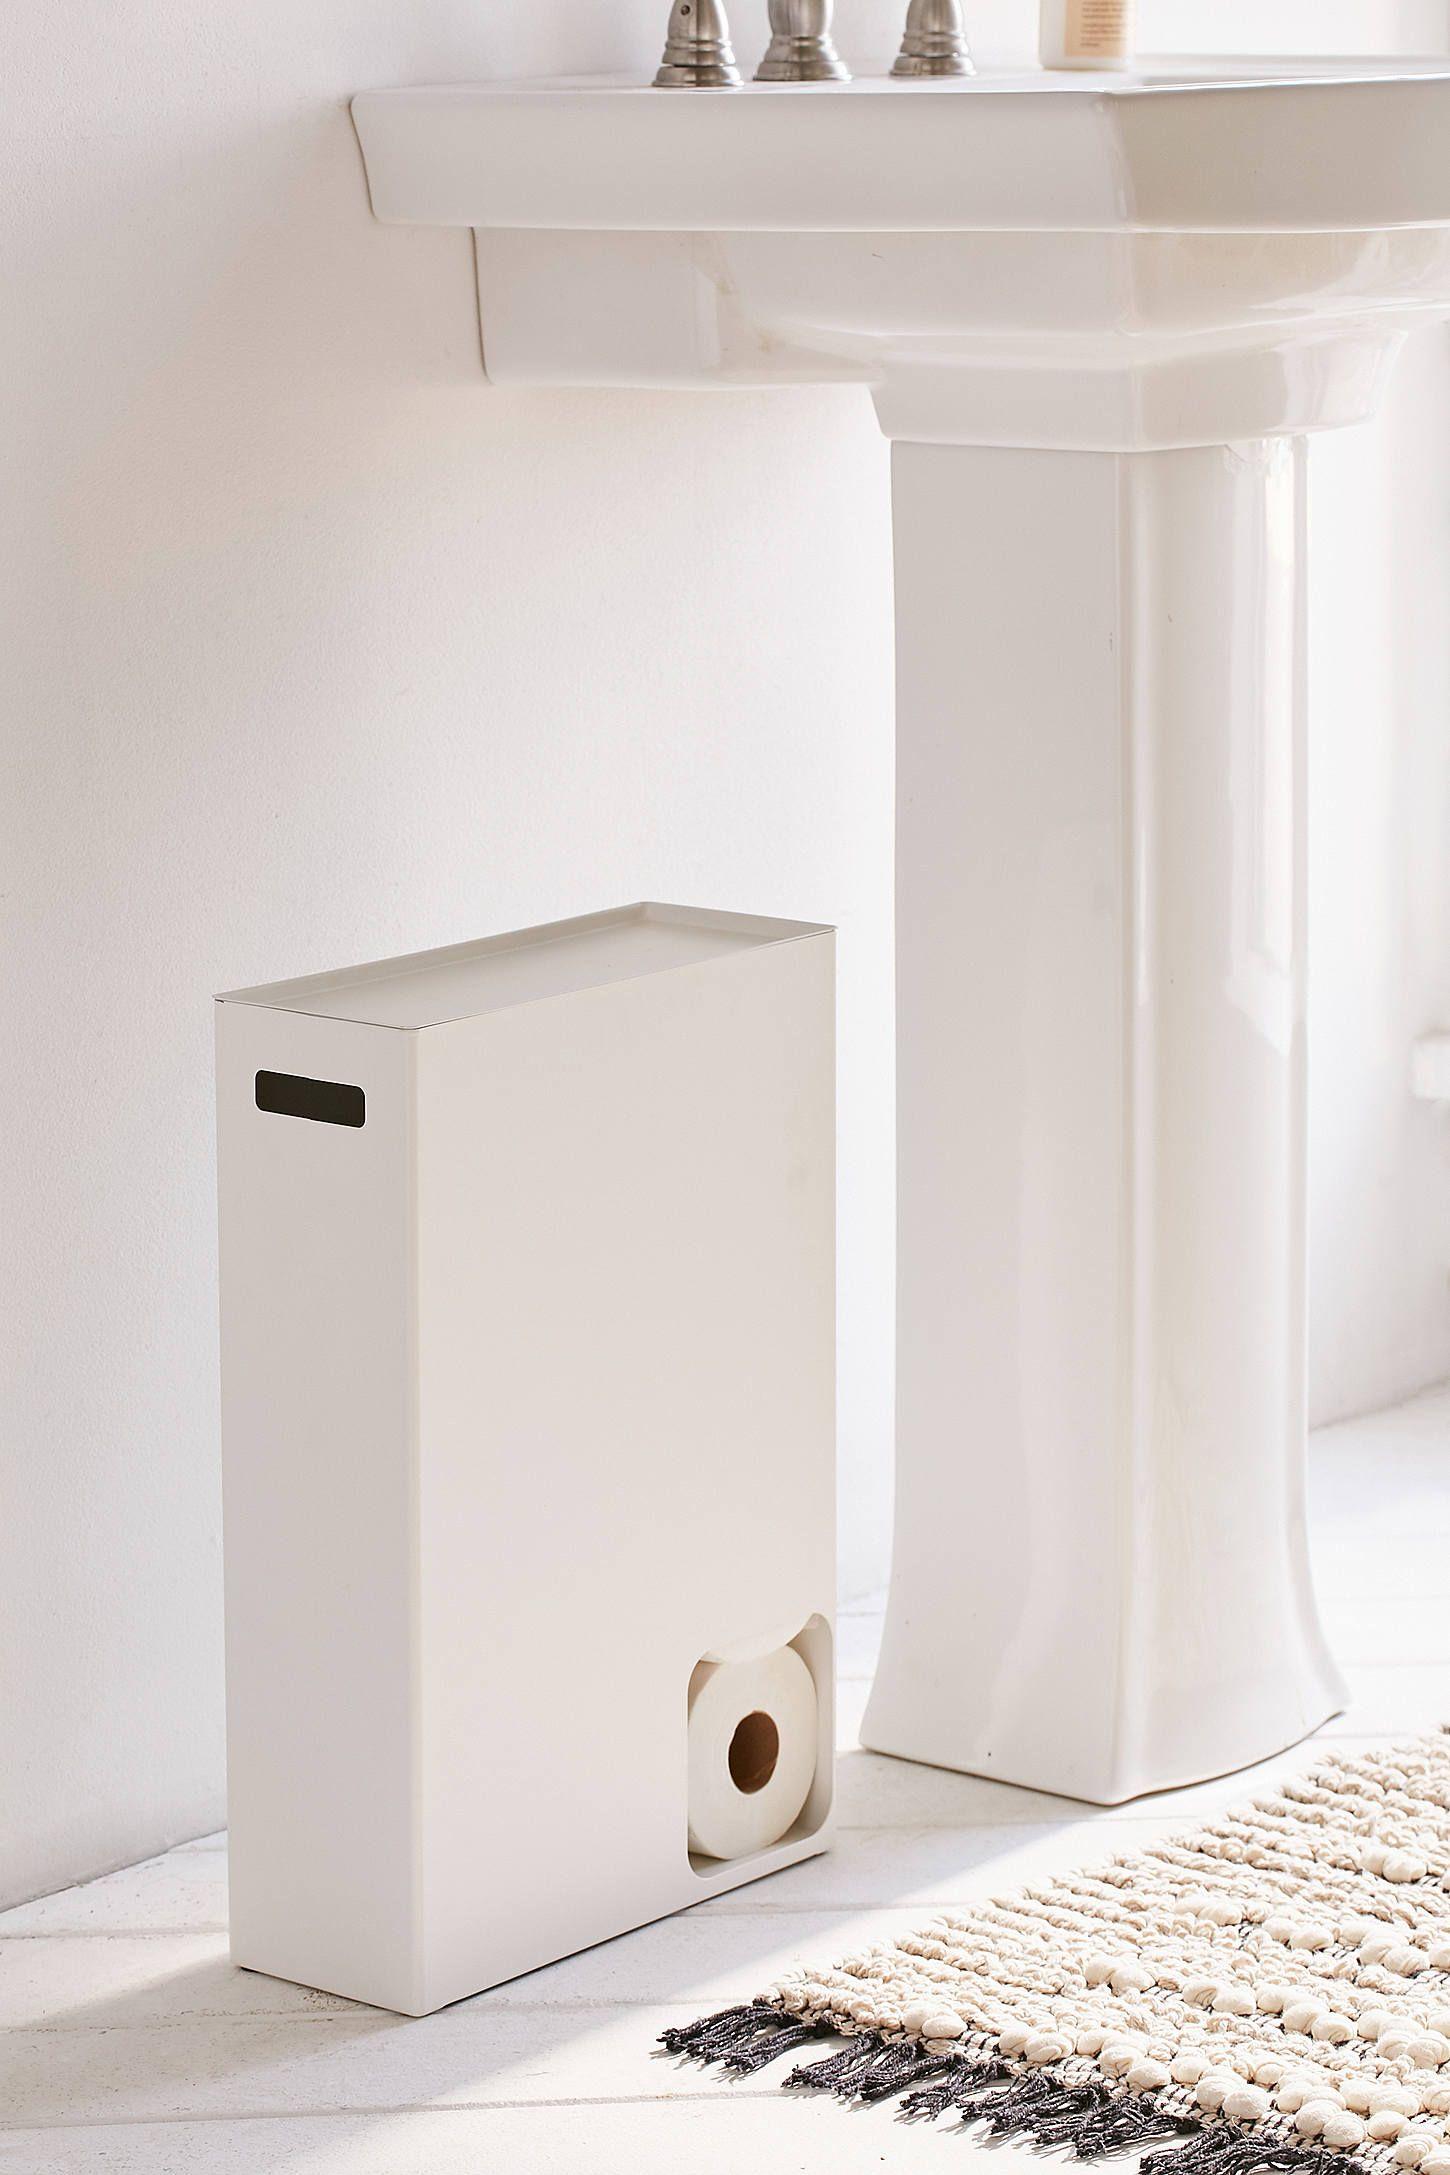 Minimal Toilet Paper Dispenser